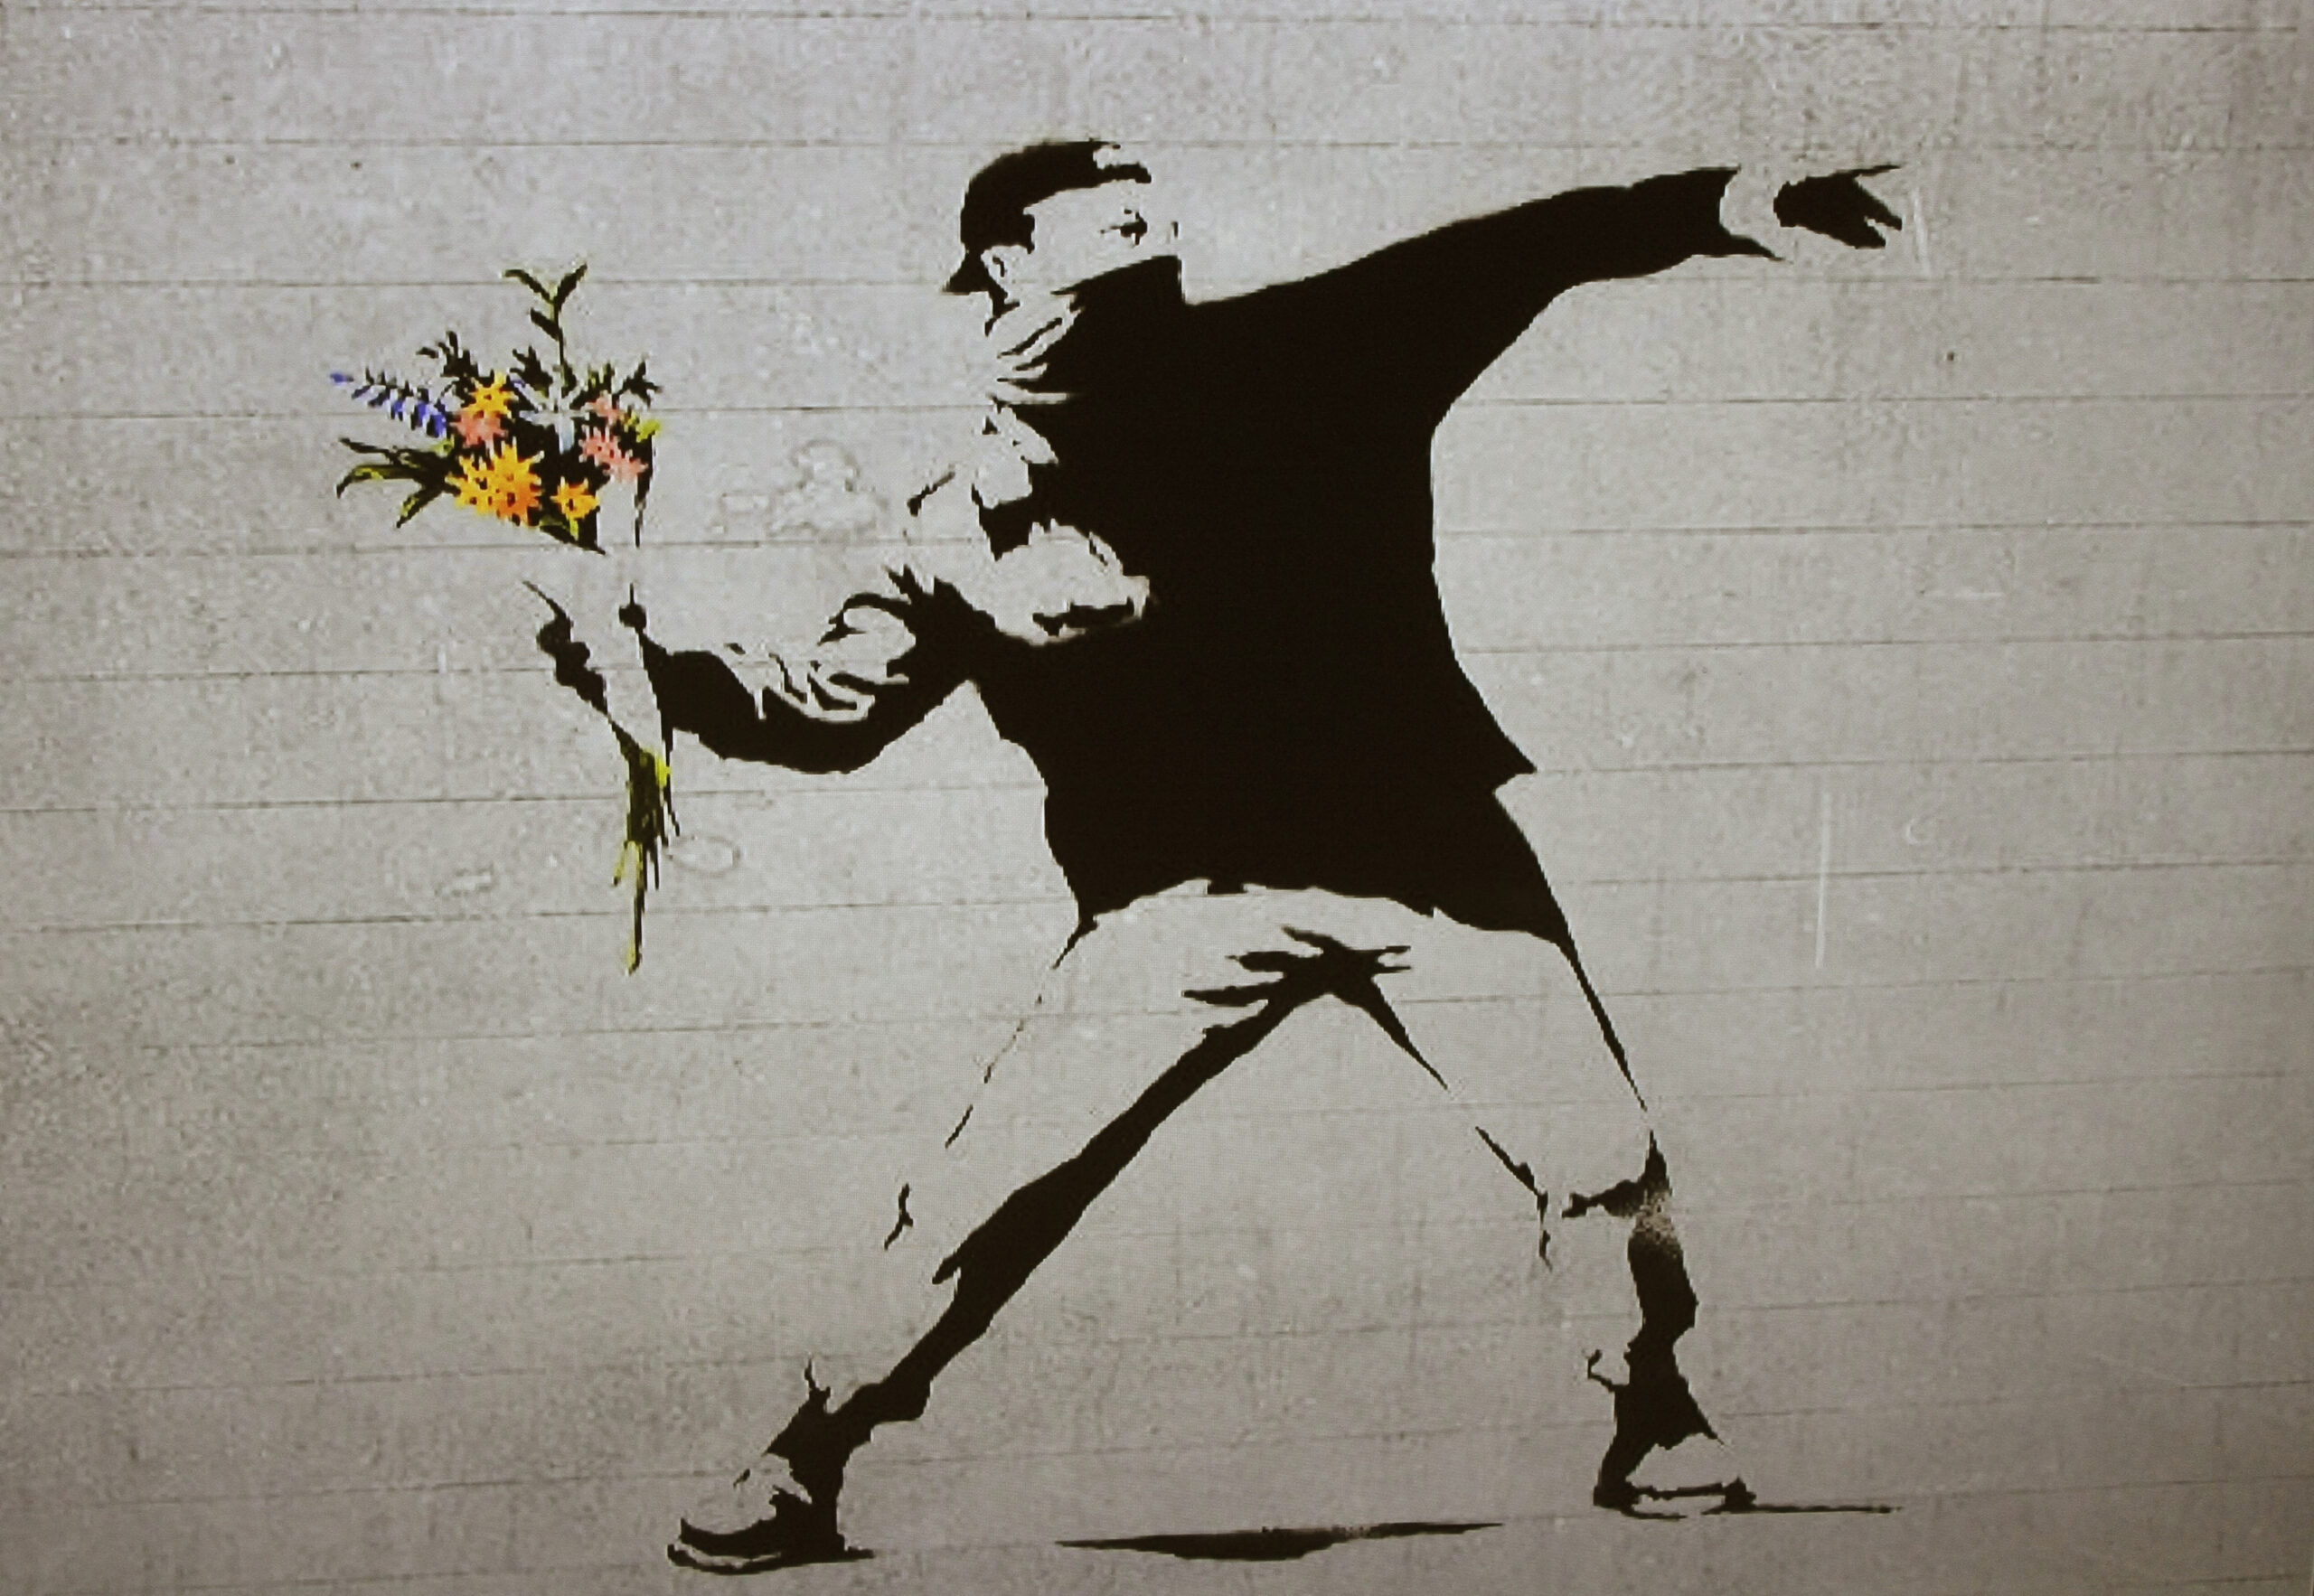 Bansky-flower-Trower-lanzador-de-flores-magazinehorse